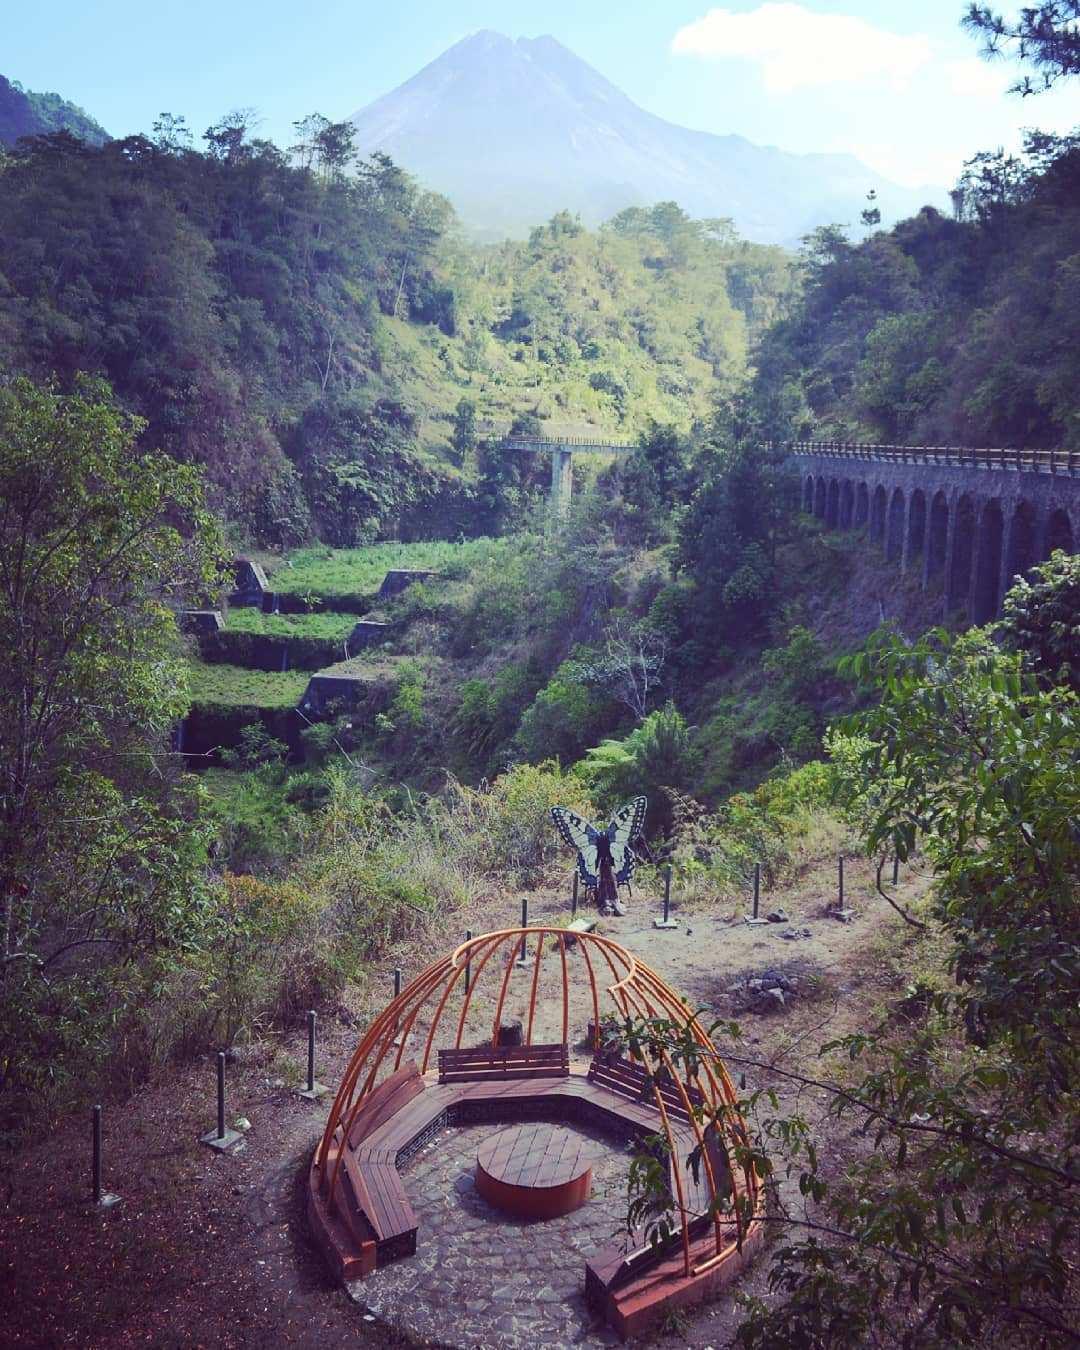 Tempat Duduk Yang Ada di Plunyon Kalikuning, Image From @artstonejogja